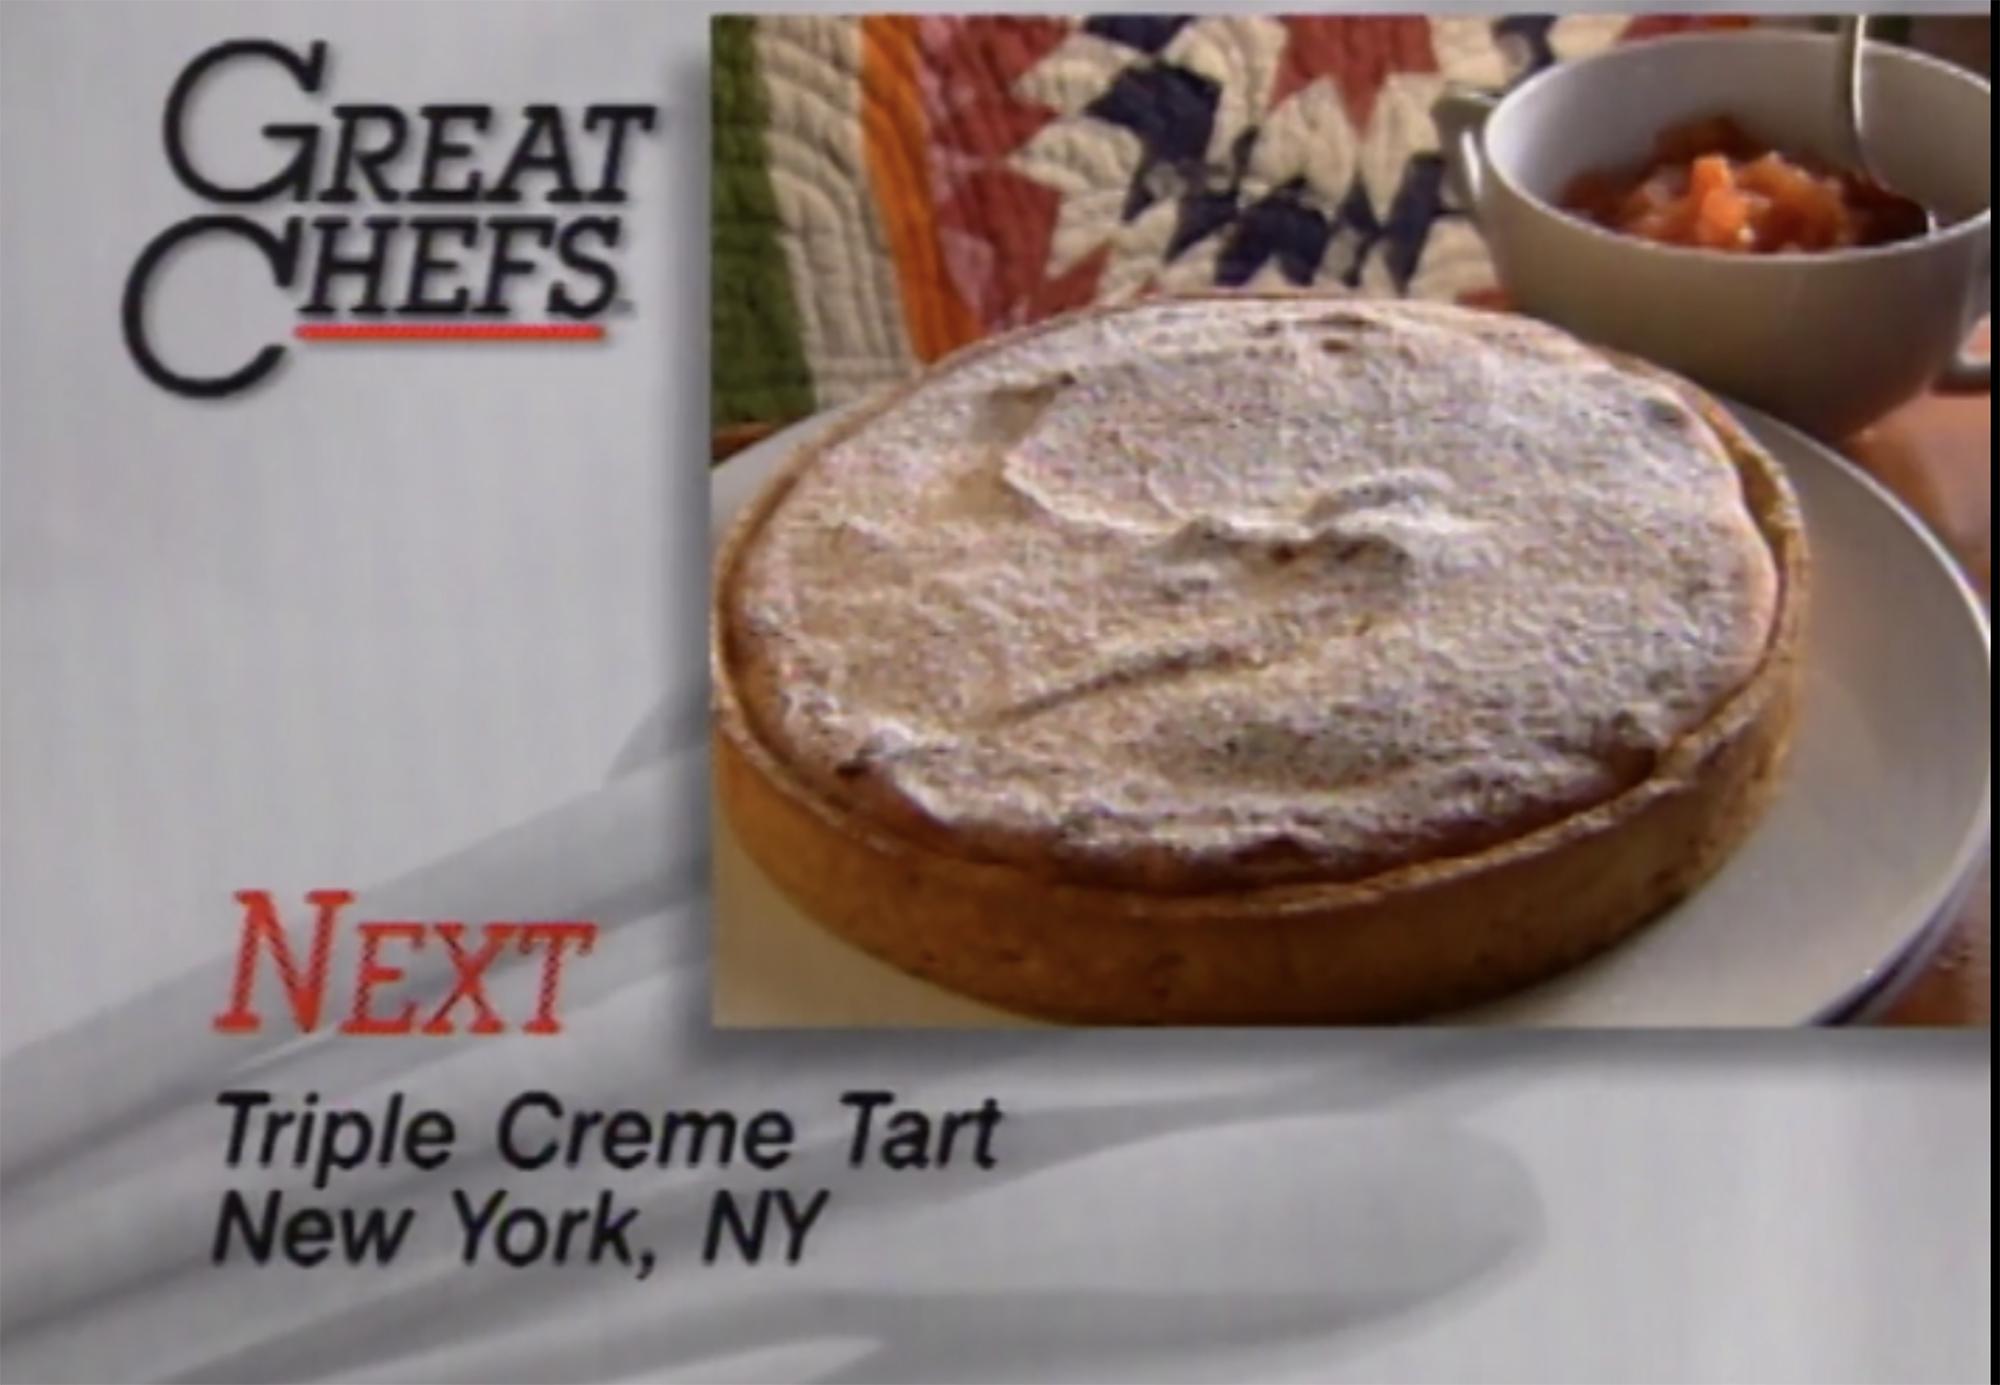 'Great Chefs' Is Amazon Prime's Best Kept Culinary Secret